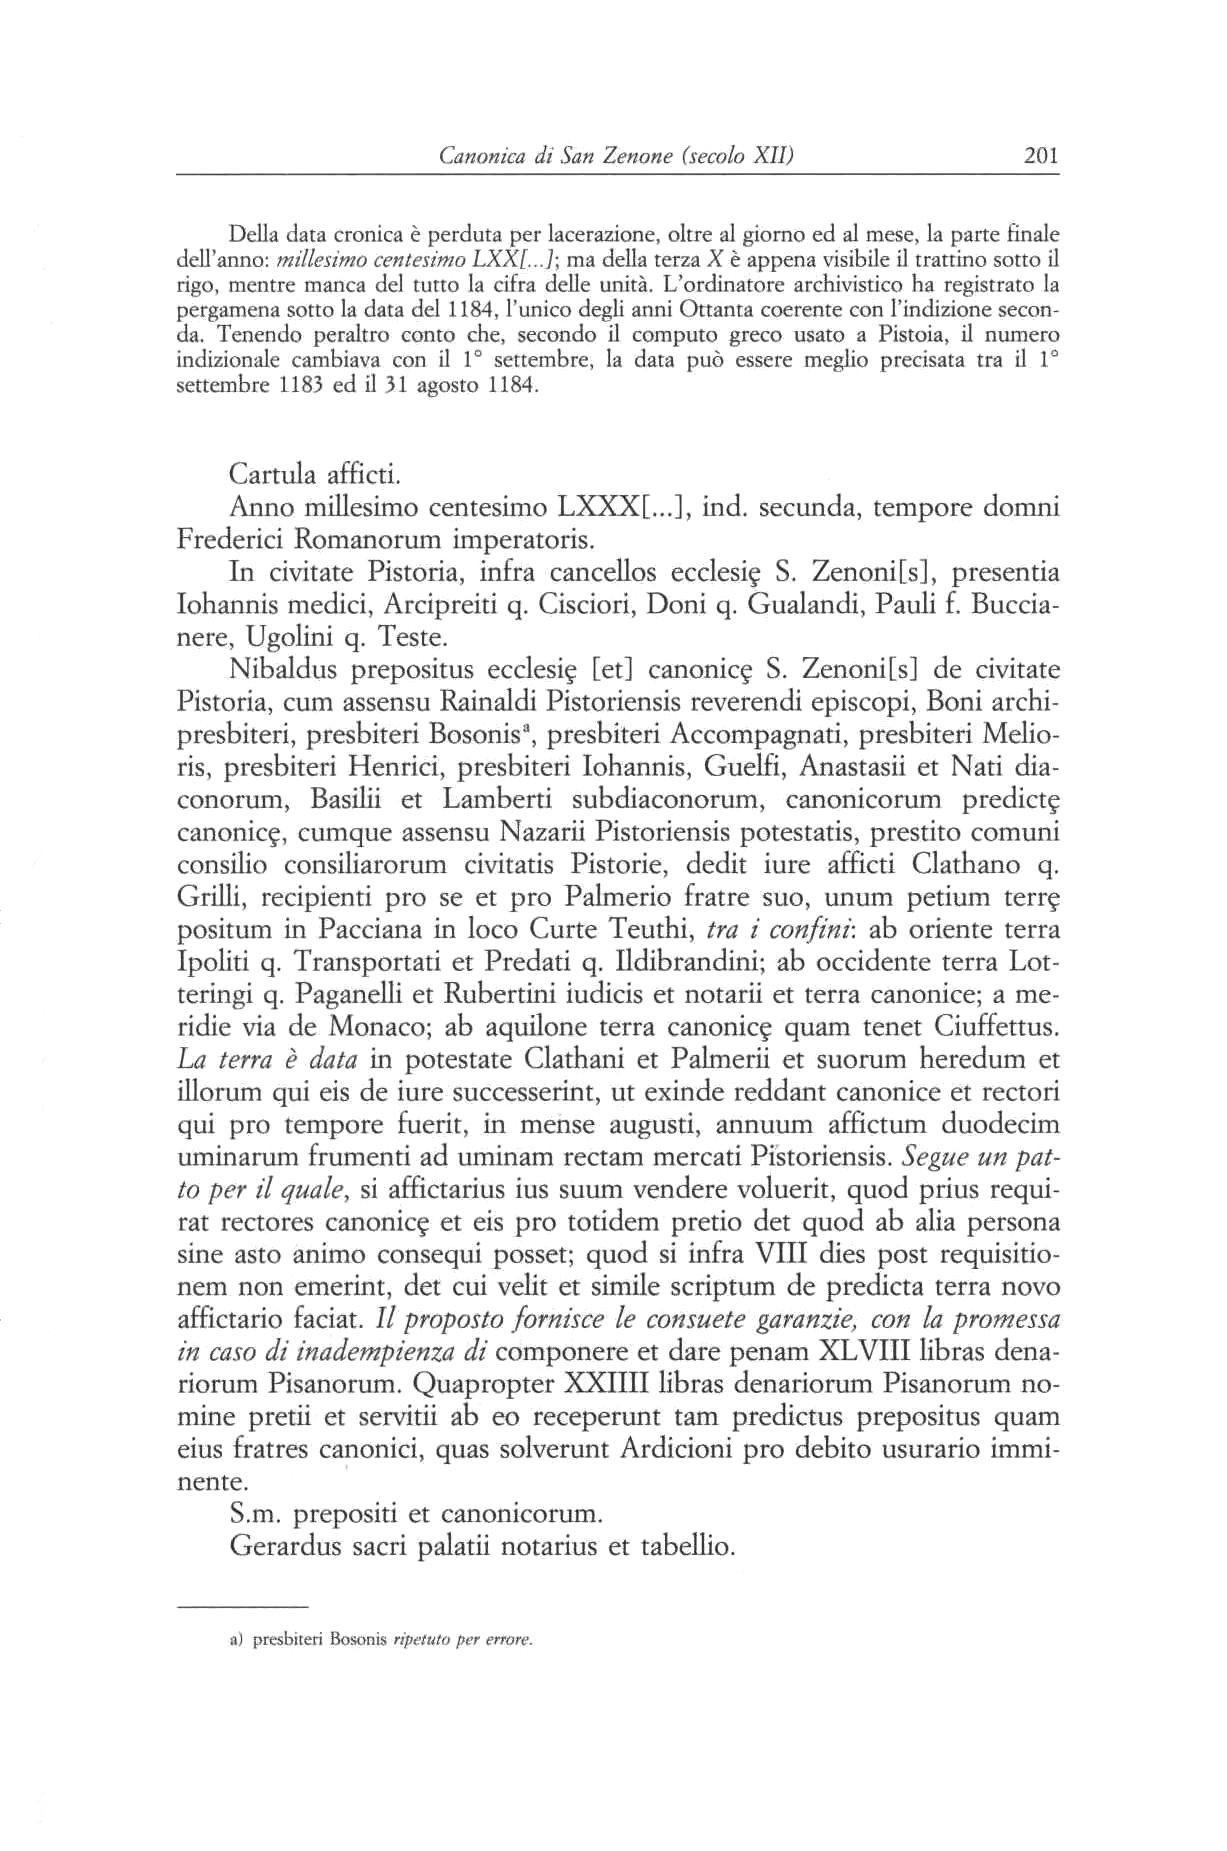 Canonica S. Zenone XII 0201.jpg